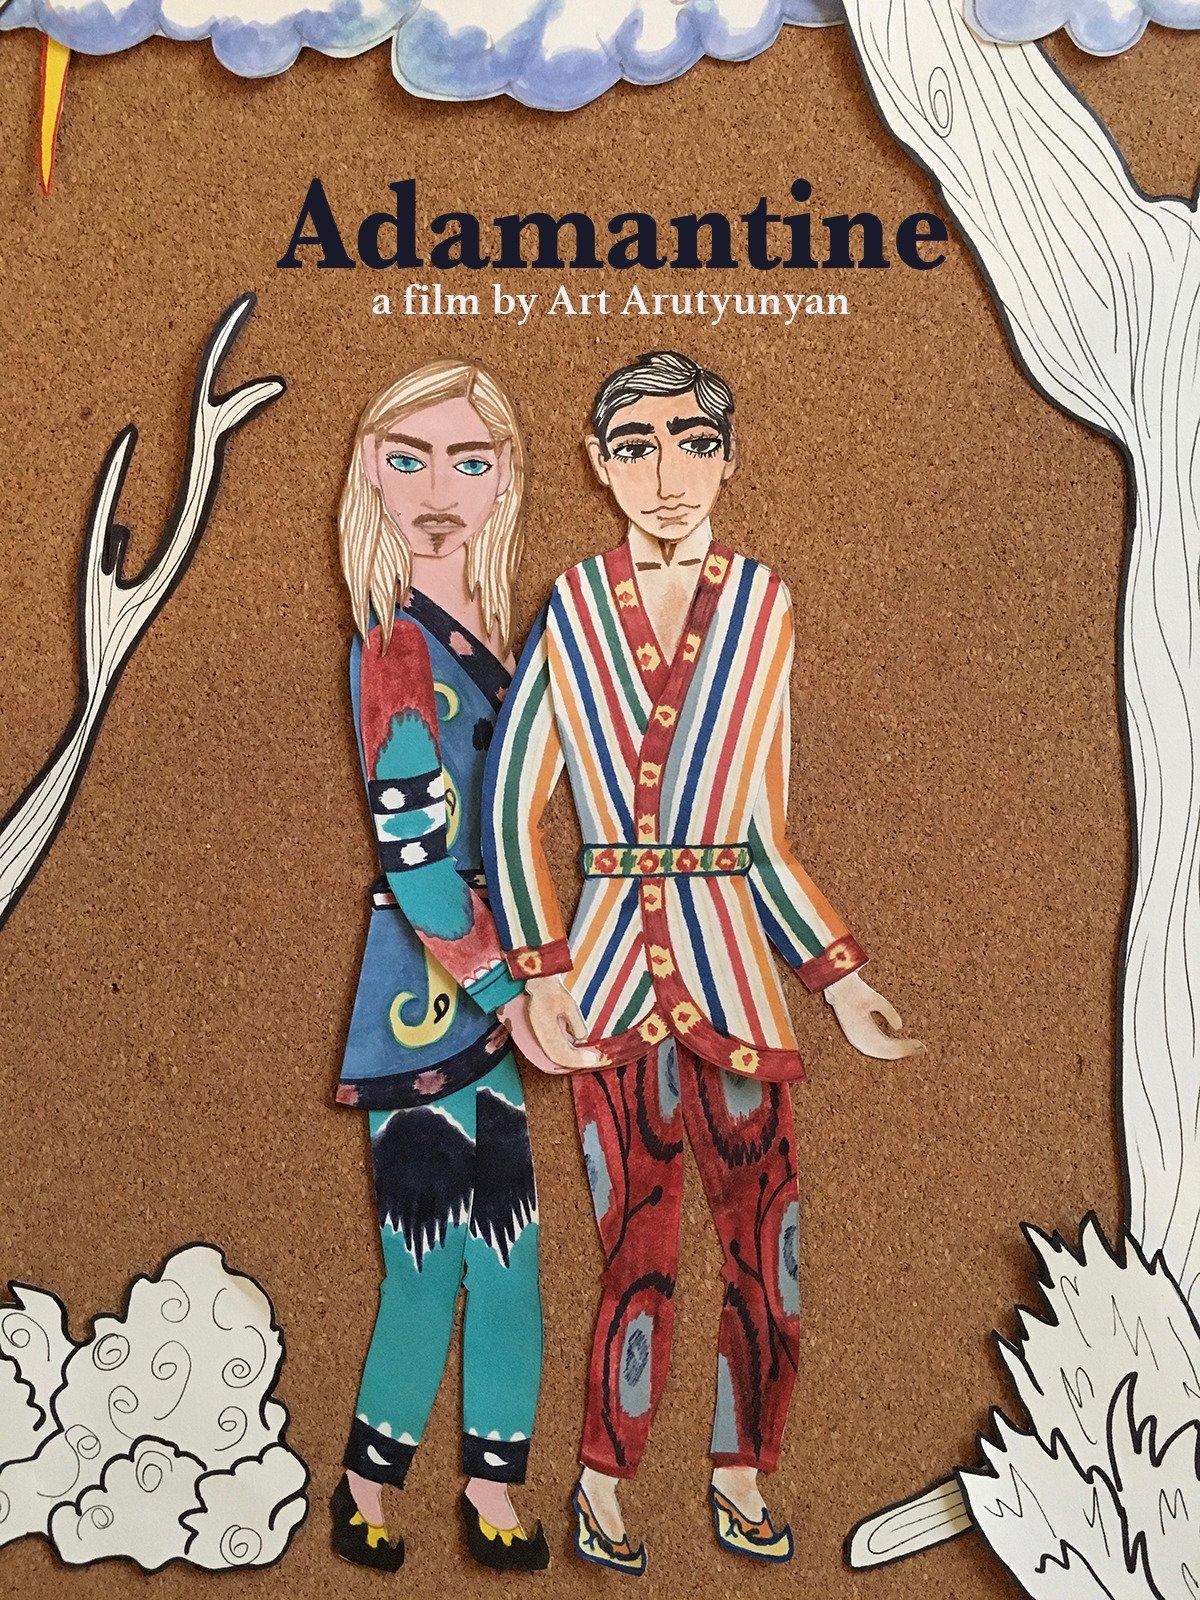 Adamantine